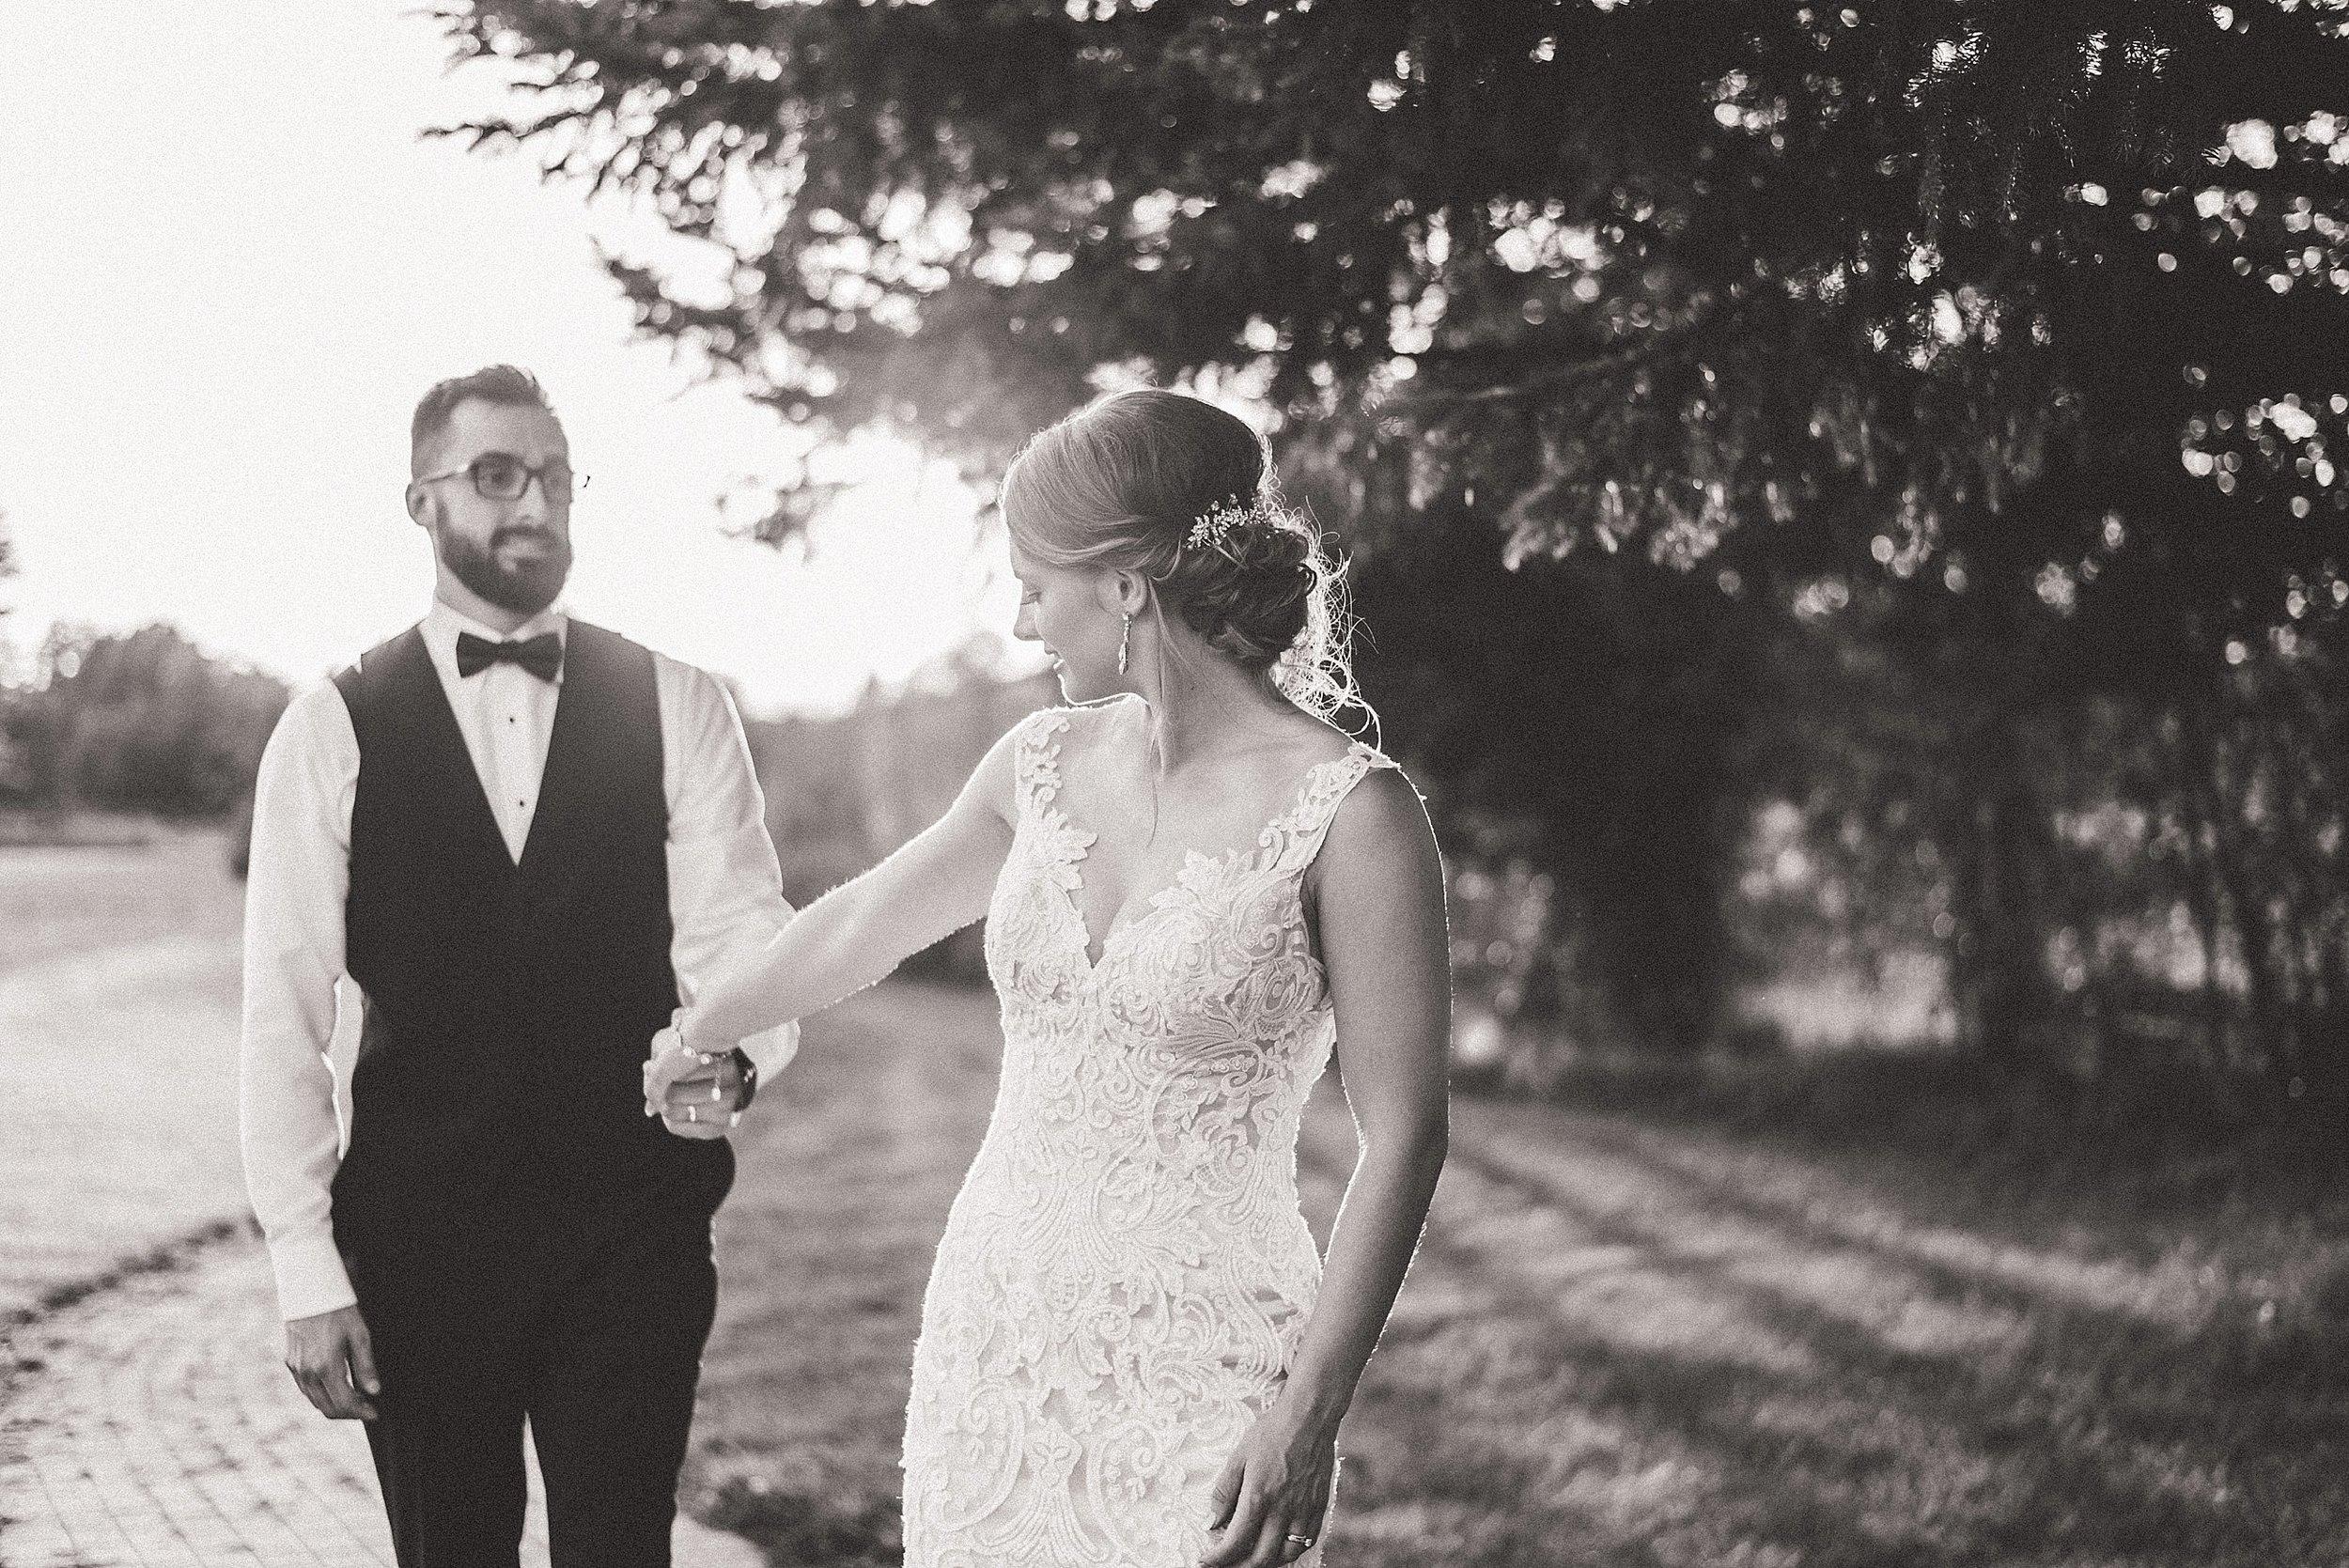 light airy indie fine art ottawa wedding photographer | Ali and Batoul Photography_1352.jpg